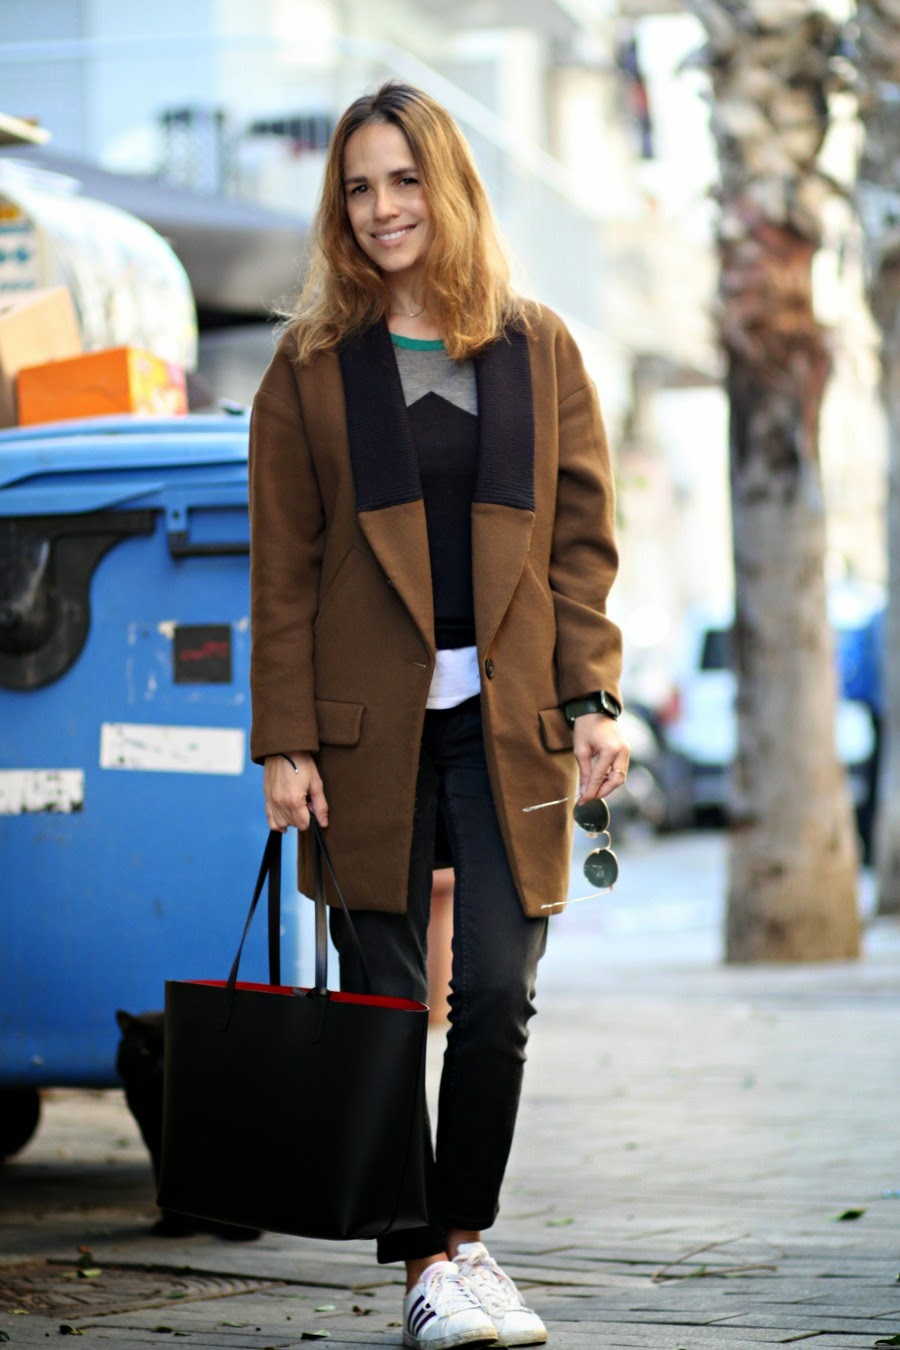 Mansur Gavriel Bag,Adidas sneakers, rag&bone Jeans,Kookai ,Zara people, style,fashion,look,fashionblog,streetstyle, parisianwoman,jewscommunity